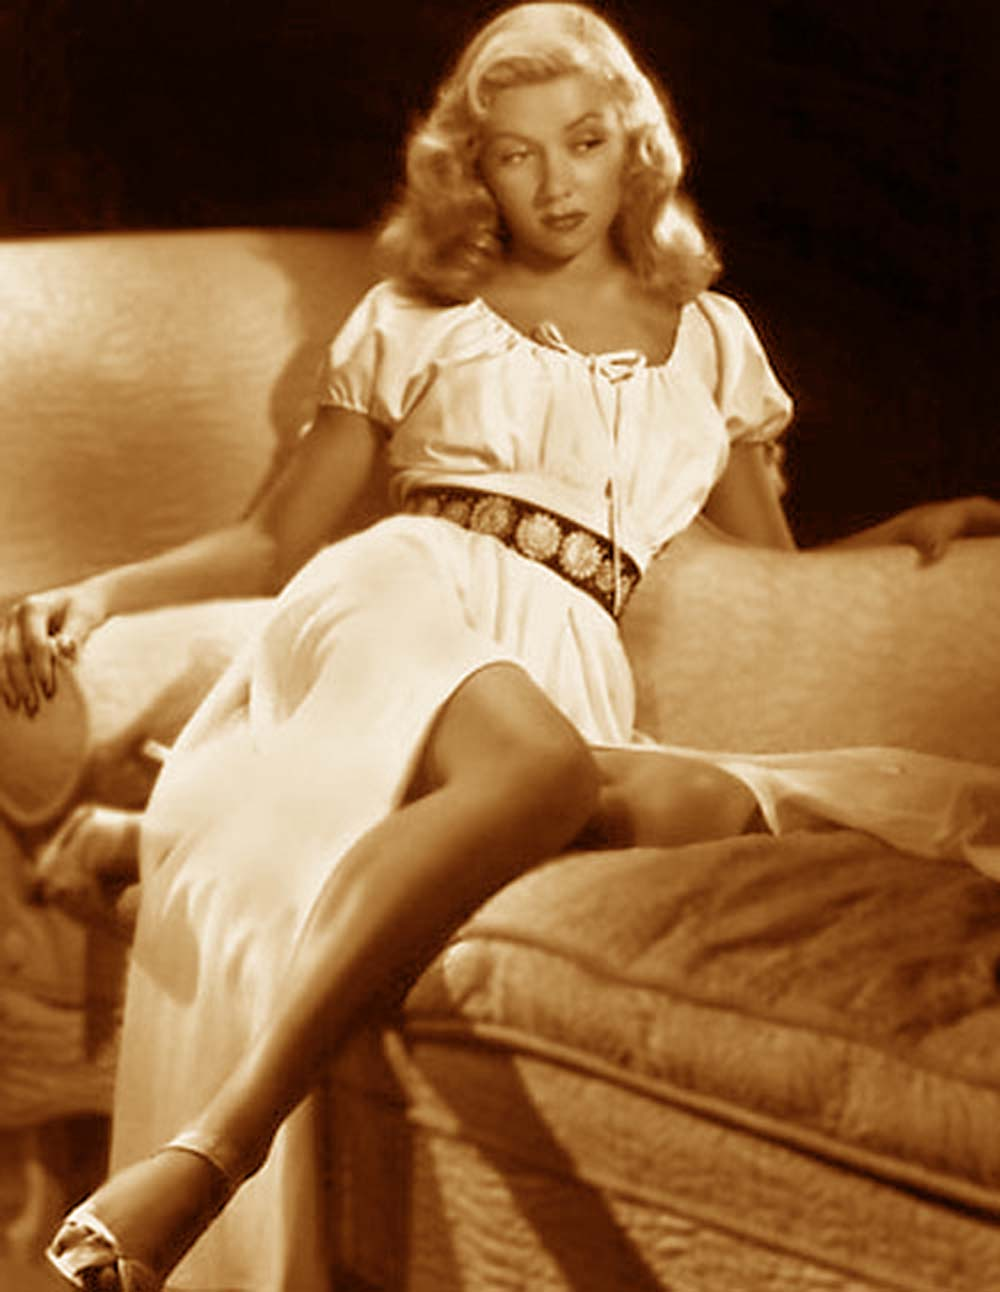 Gloria Grahame actress: Sexy film noir vixen It's a Complex Life